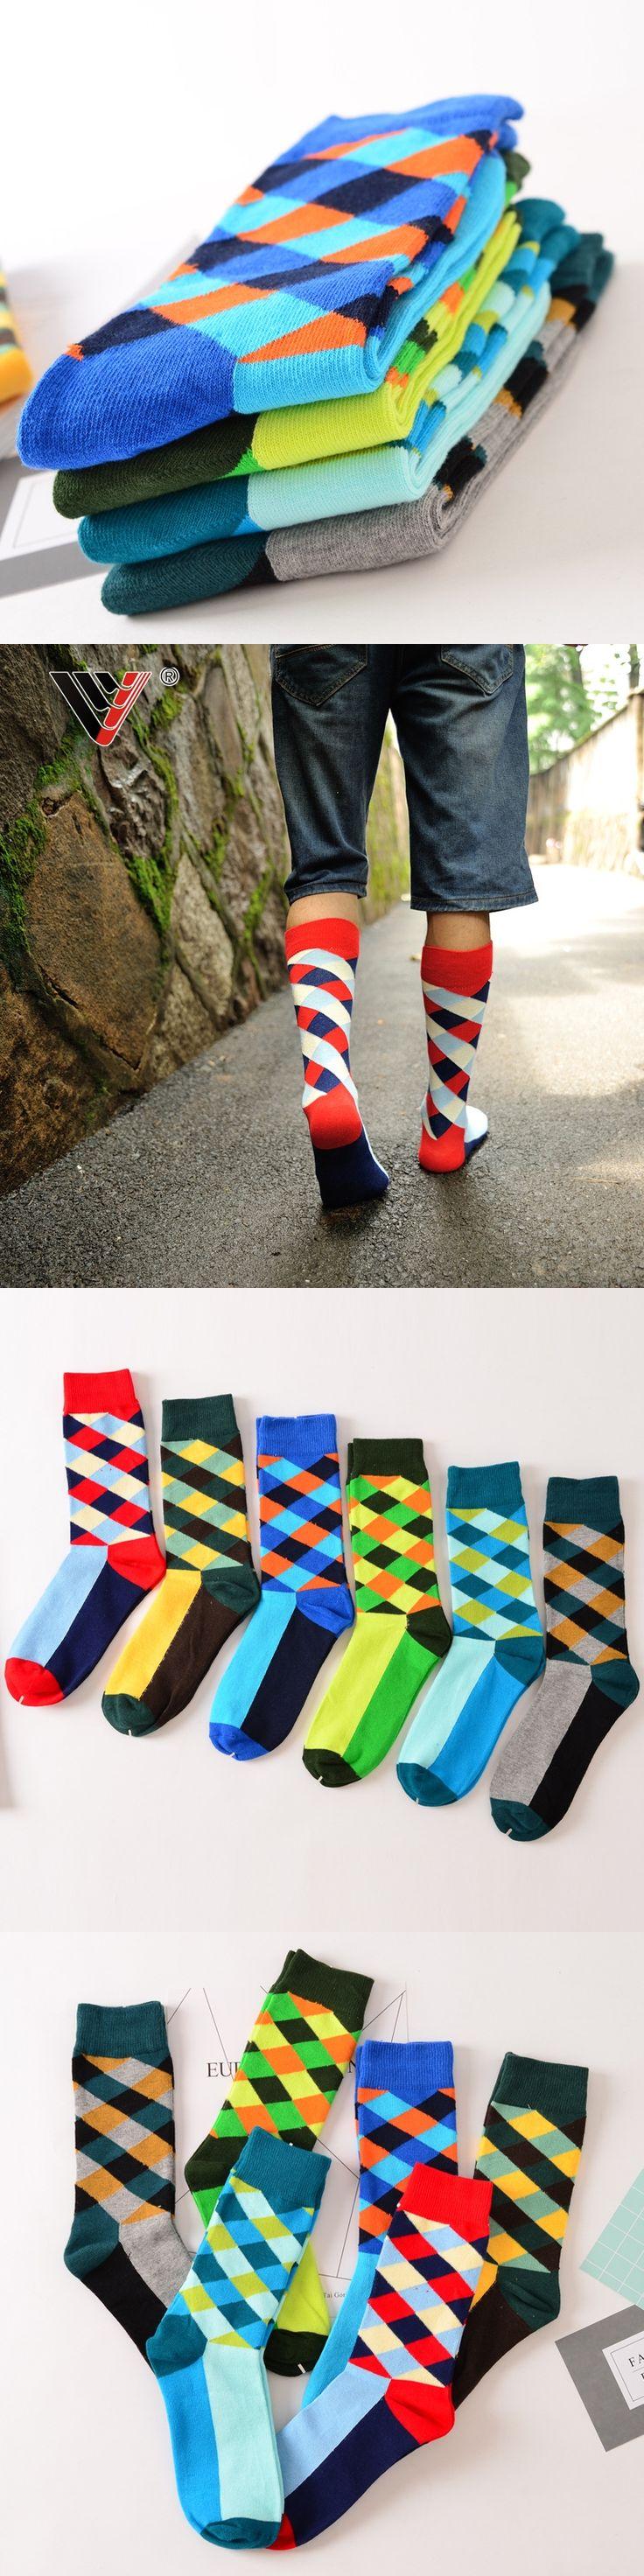 2017 New Brand socks British Style Plaid Socks Gradient Color High Quality Men's Cotton argyle Socks SIZE: EUR 40-45